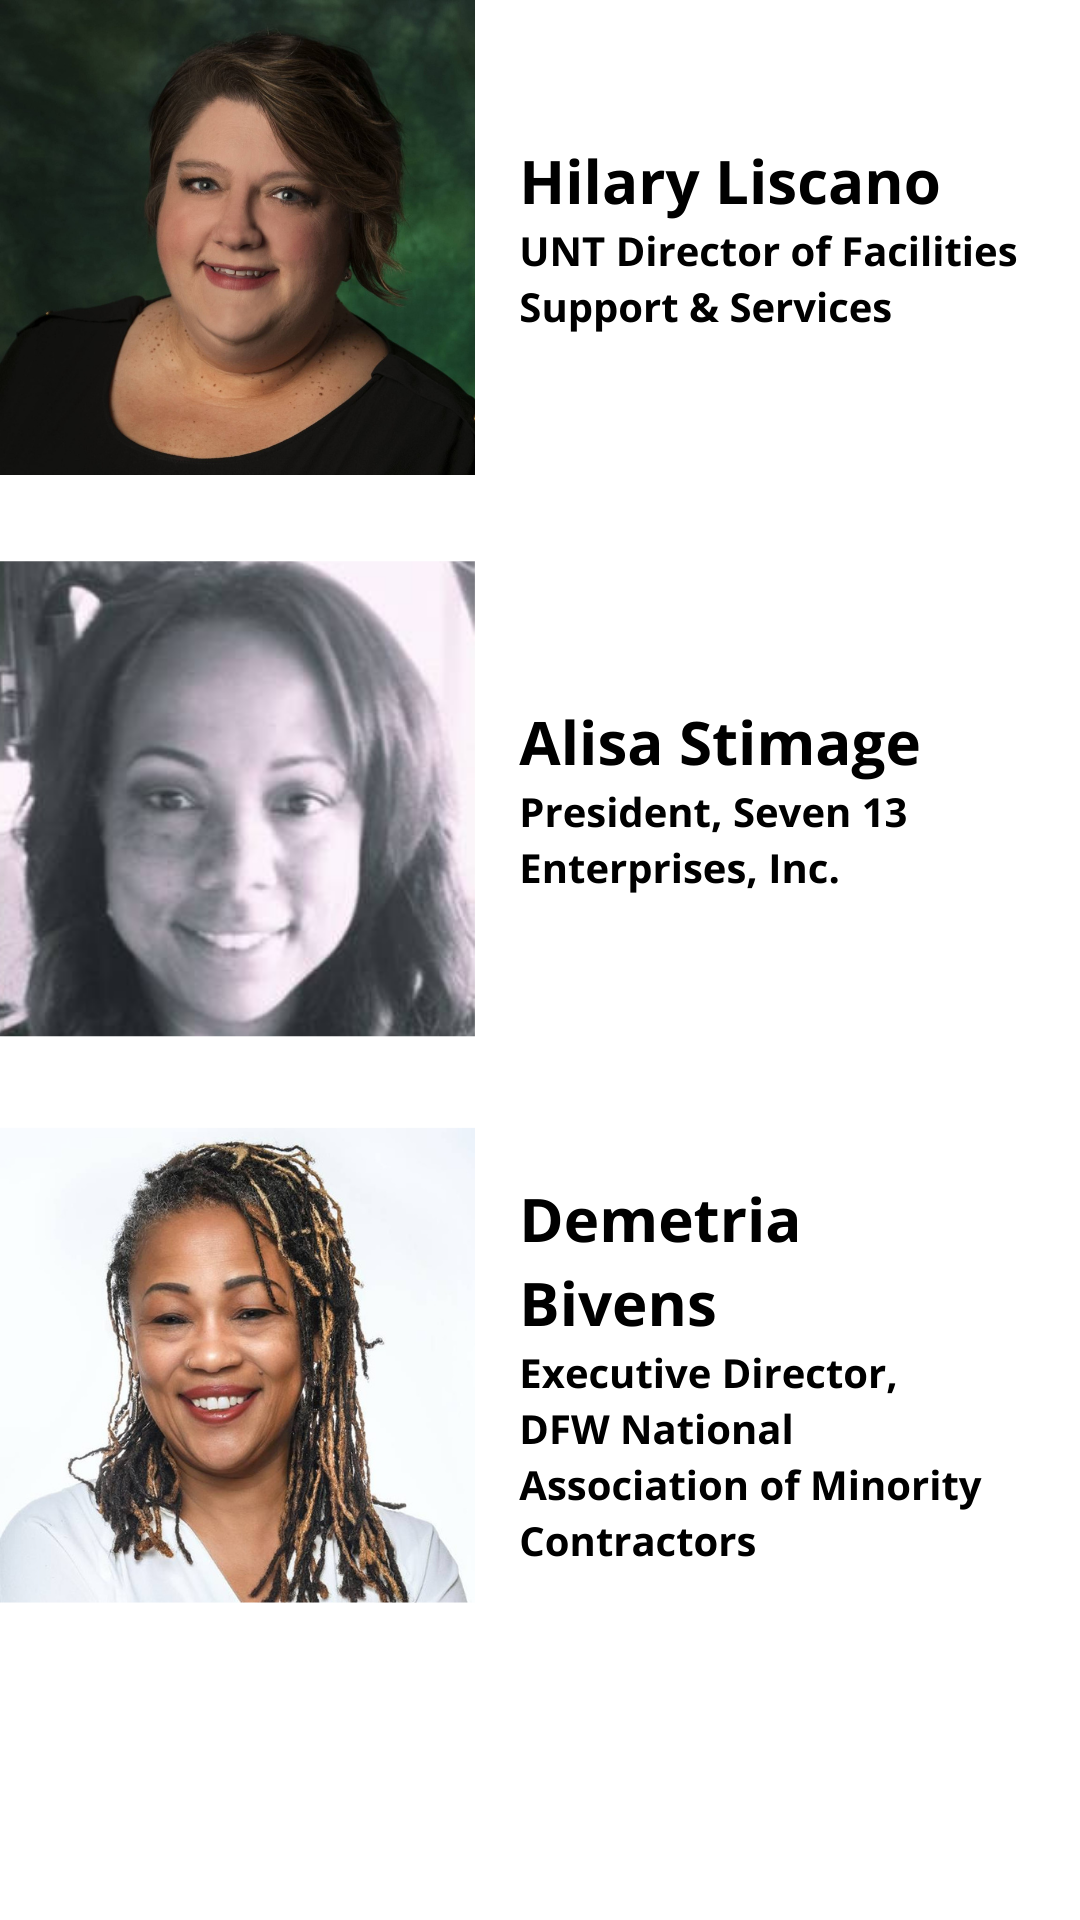 Hilary Liscano, UNT Director of Facilities Support & Services; Alisa Stimage, President, Seven 13 Enterprises, Inc.; Demetria Bivens, Executive Director, DFW National Association of Minority Contractors